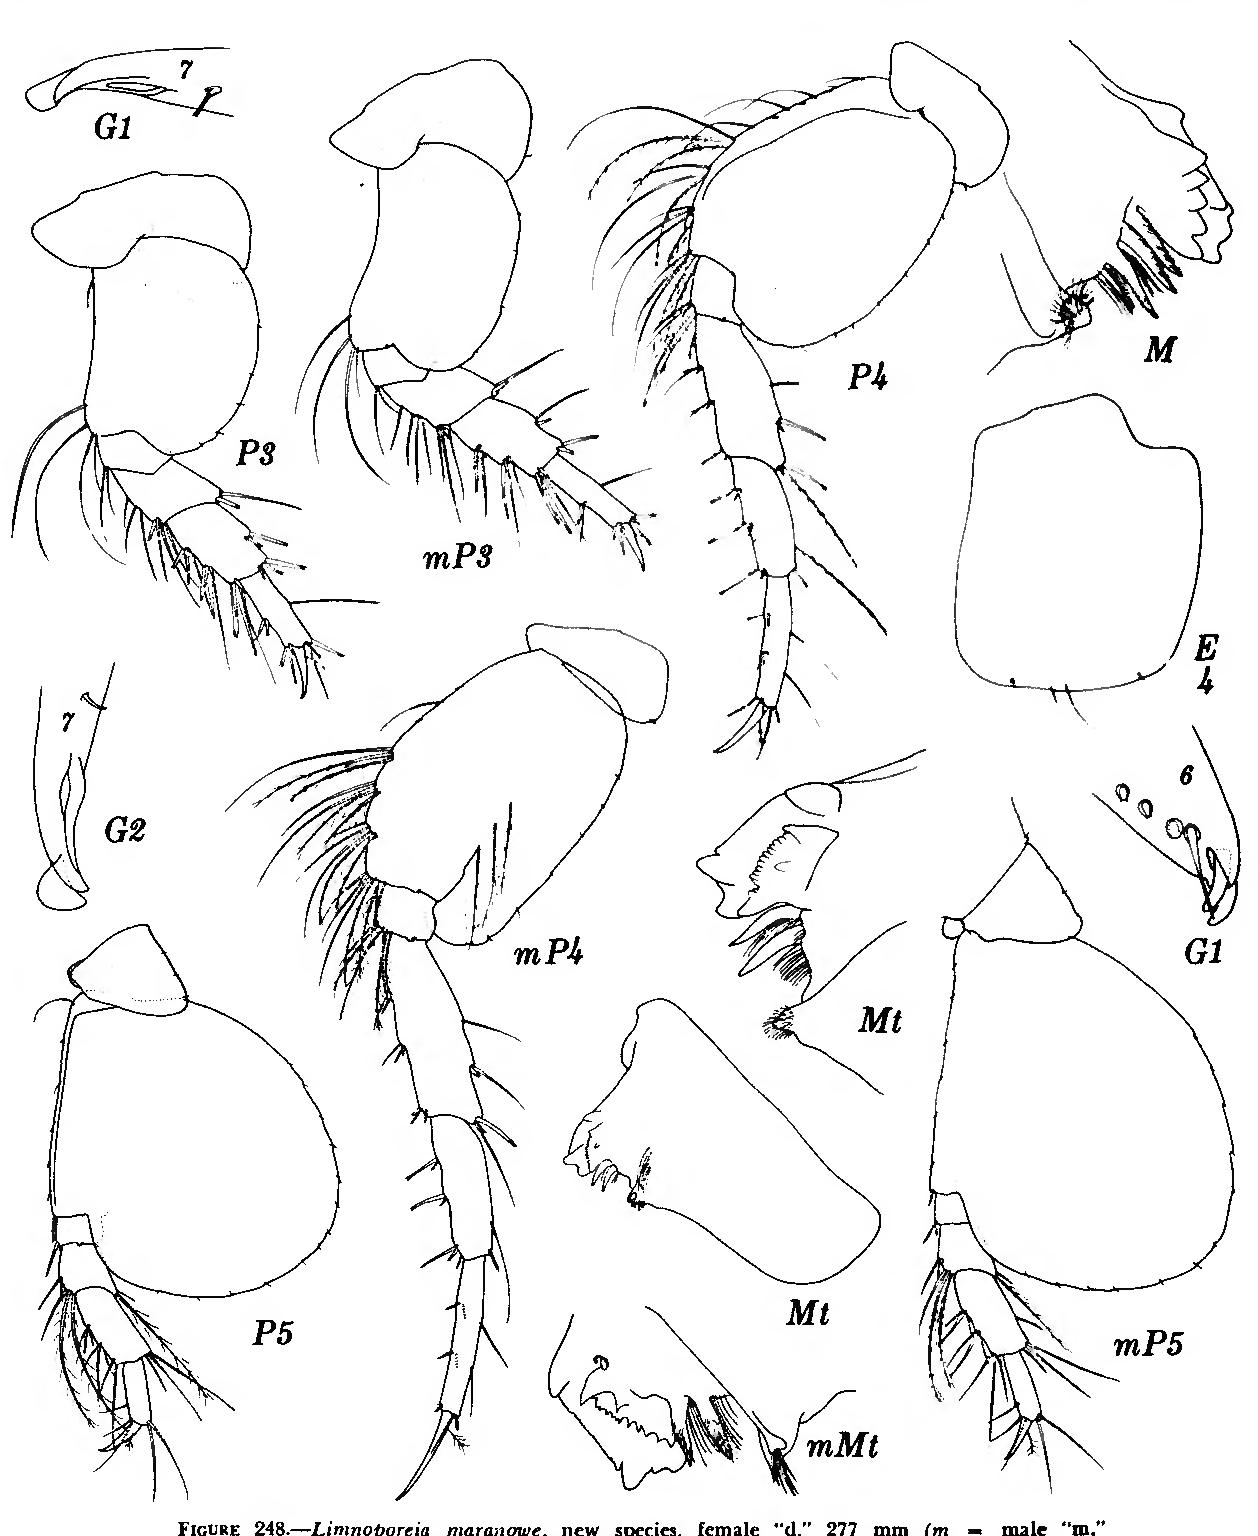 figure 248